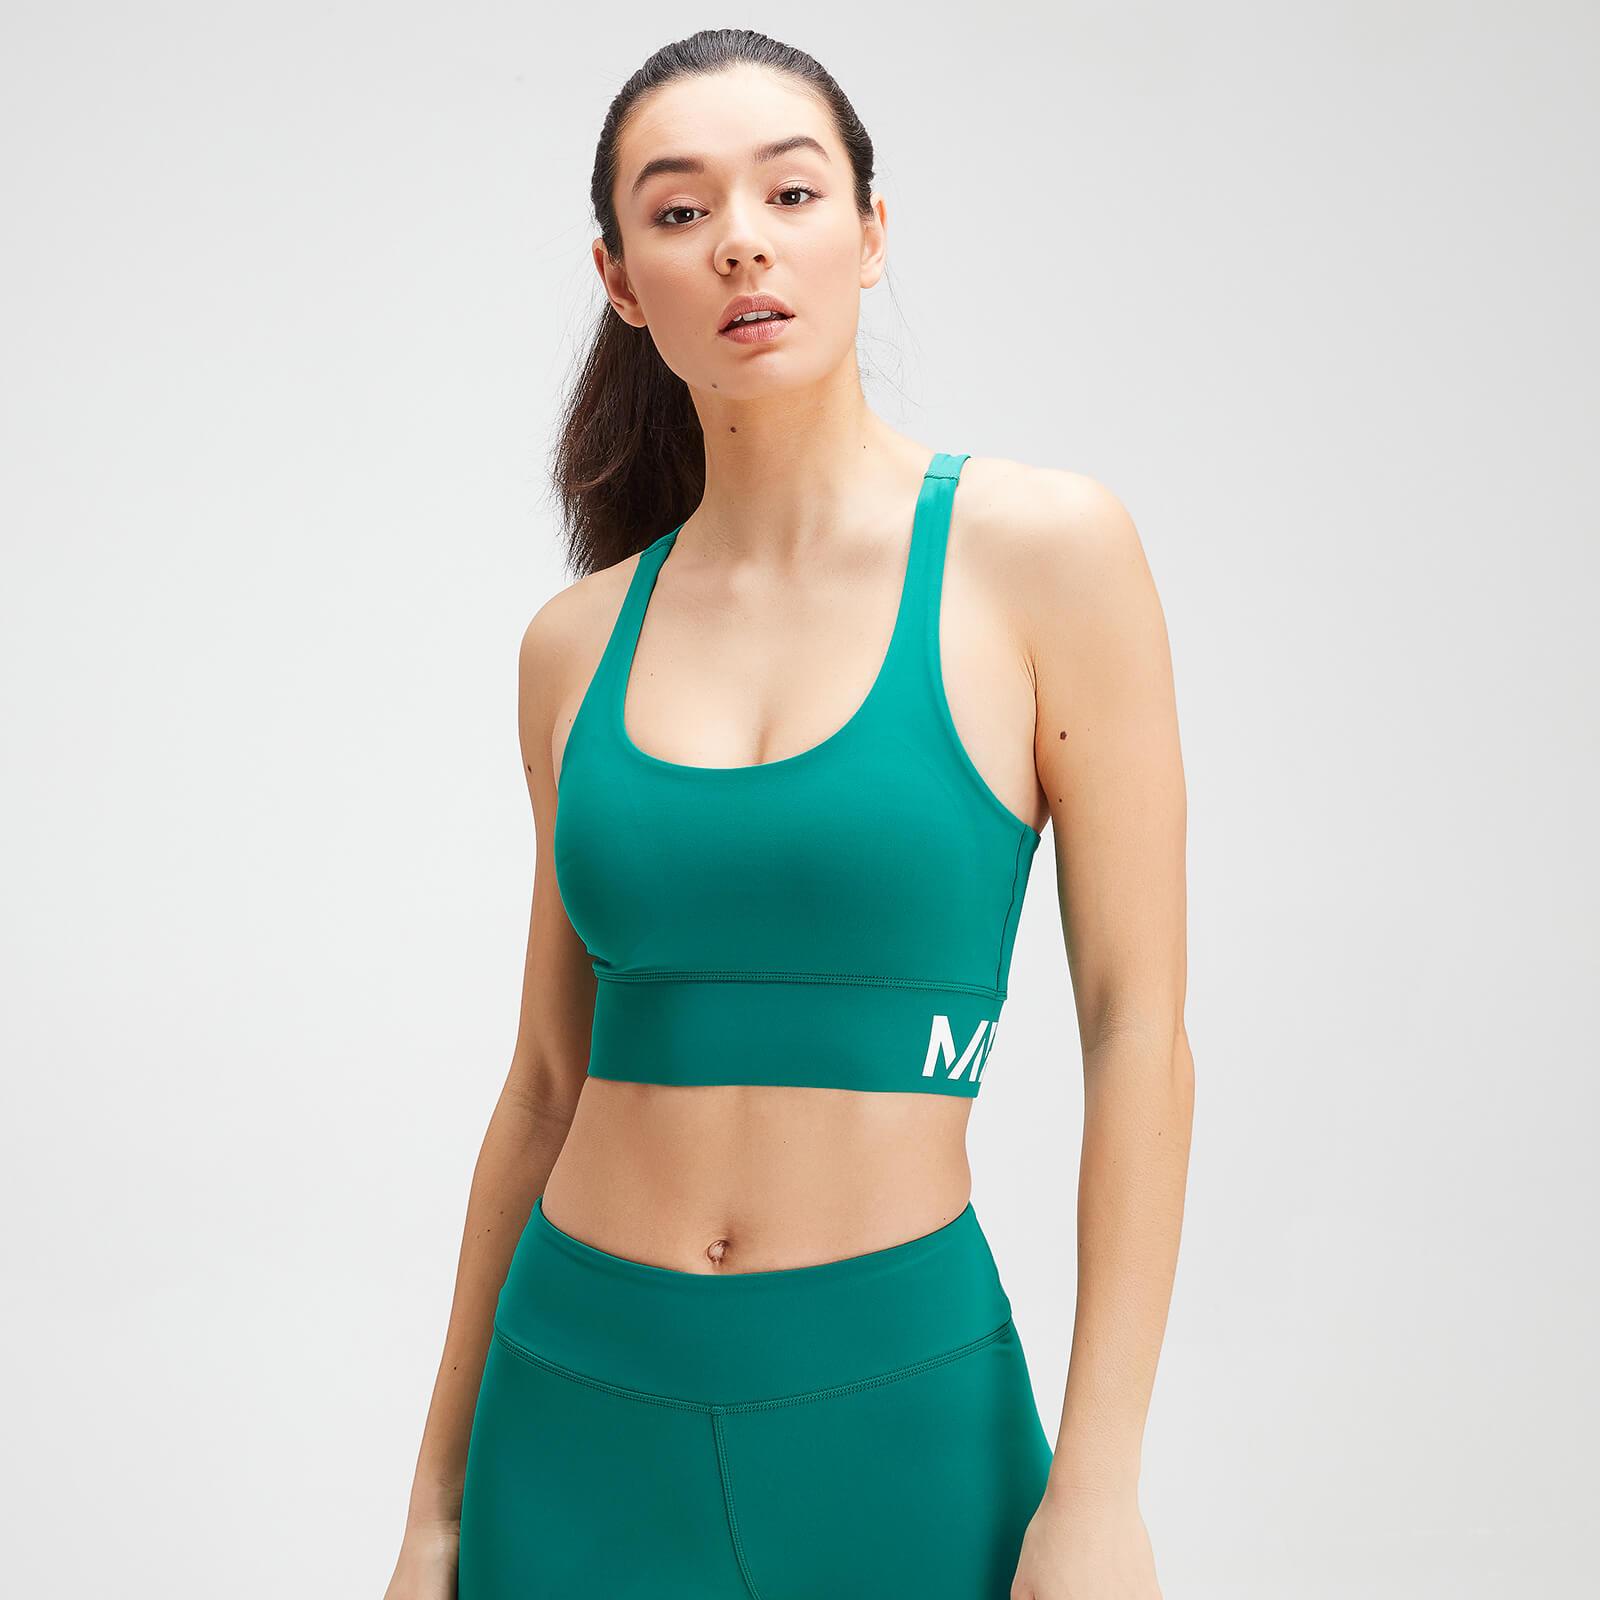 MP Women's Essentials Training Sports Bra - Energy Green - S